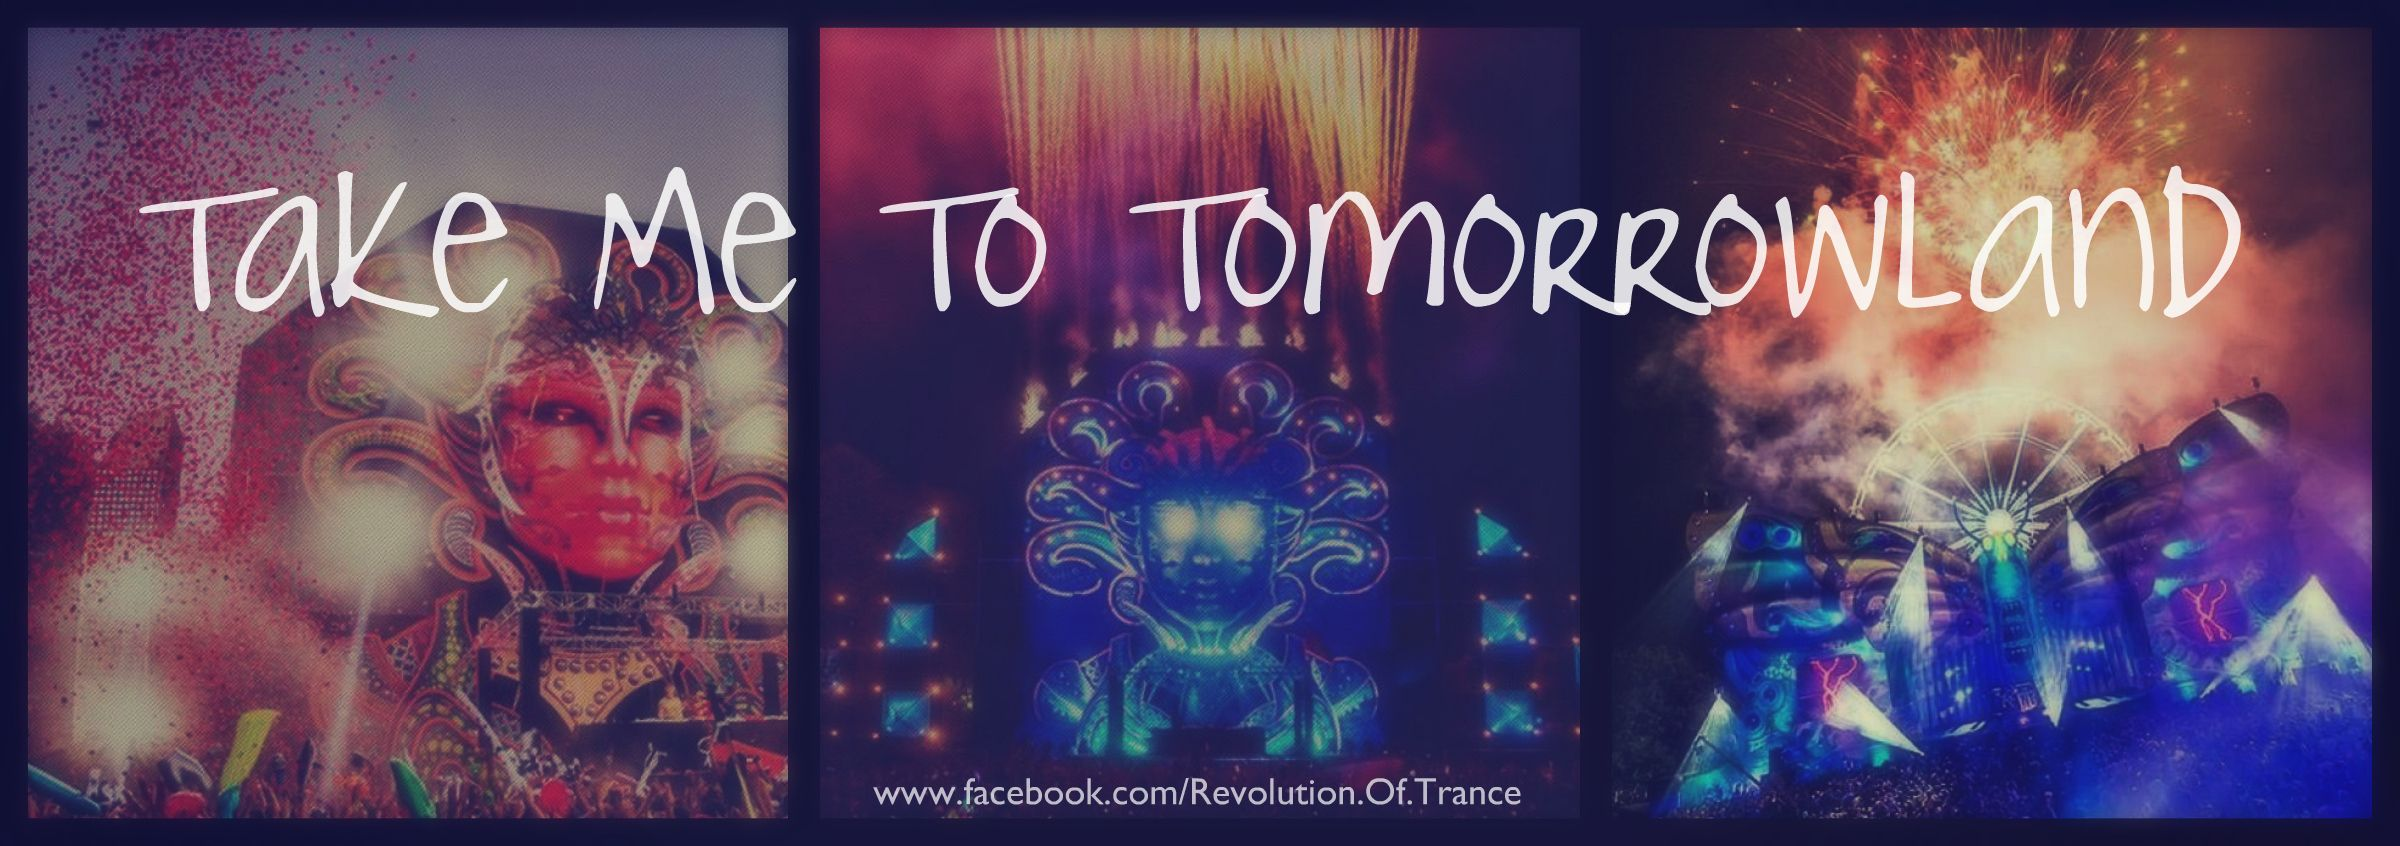 #Tomorrowland #EDM #Trance #House #RAVE www.facebook.com/Revolution.Of.Trance